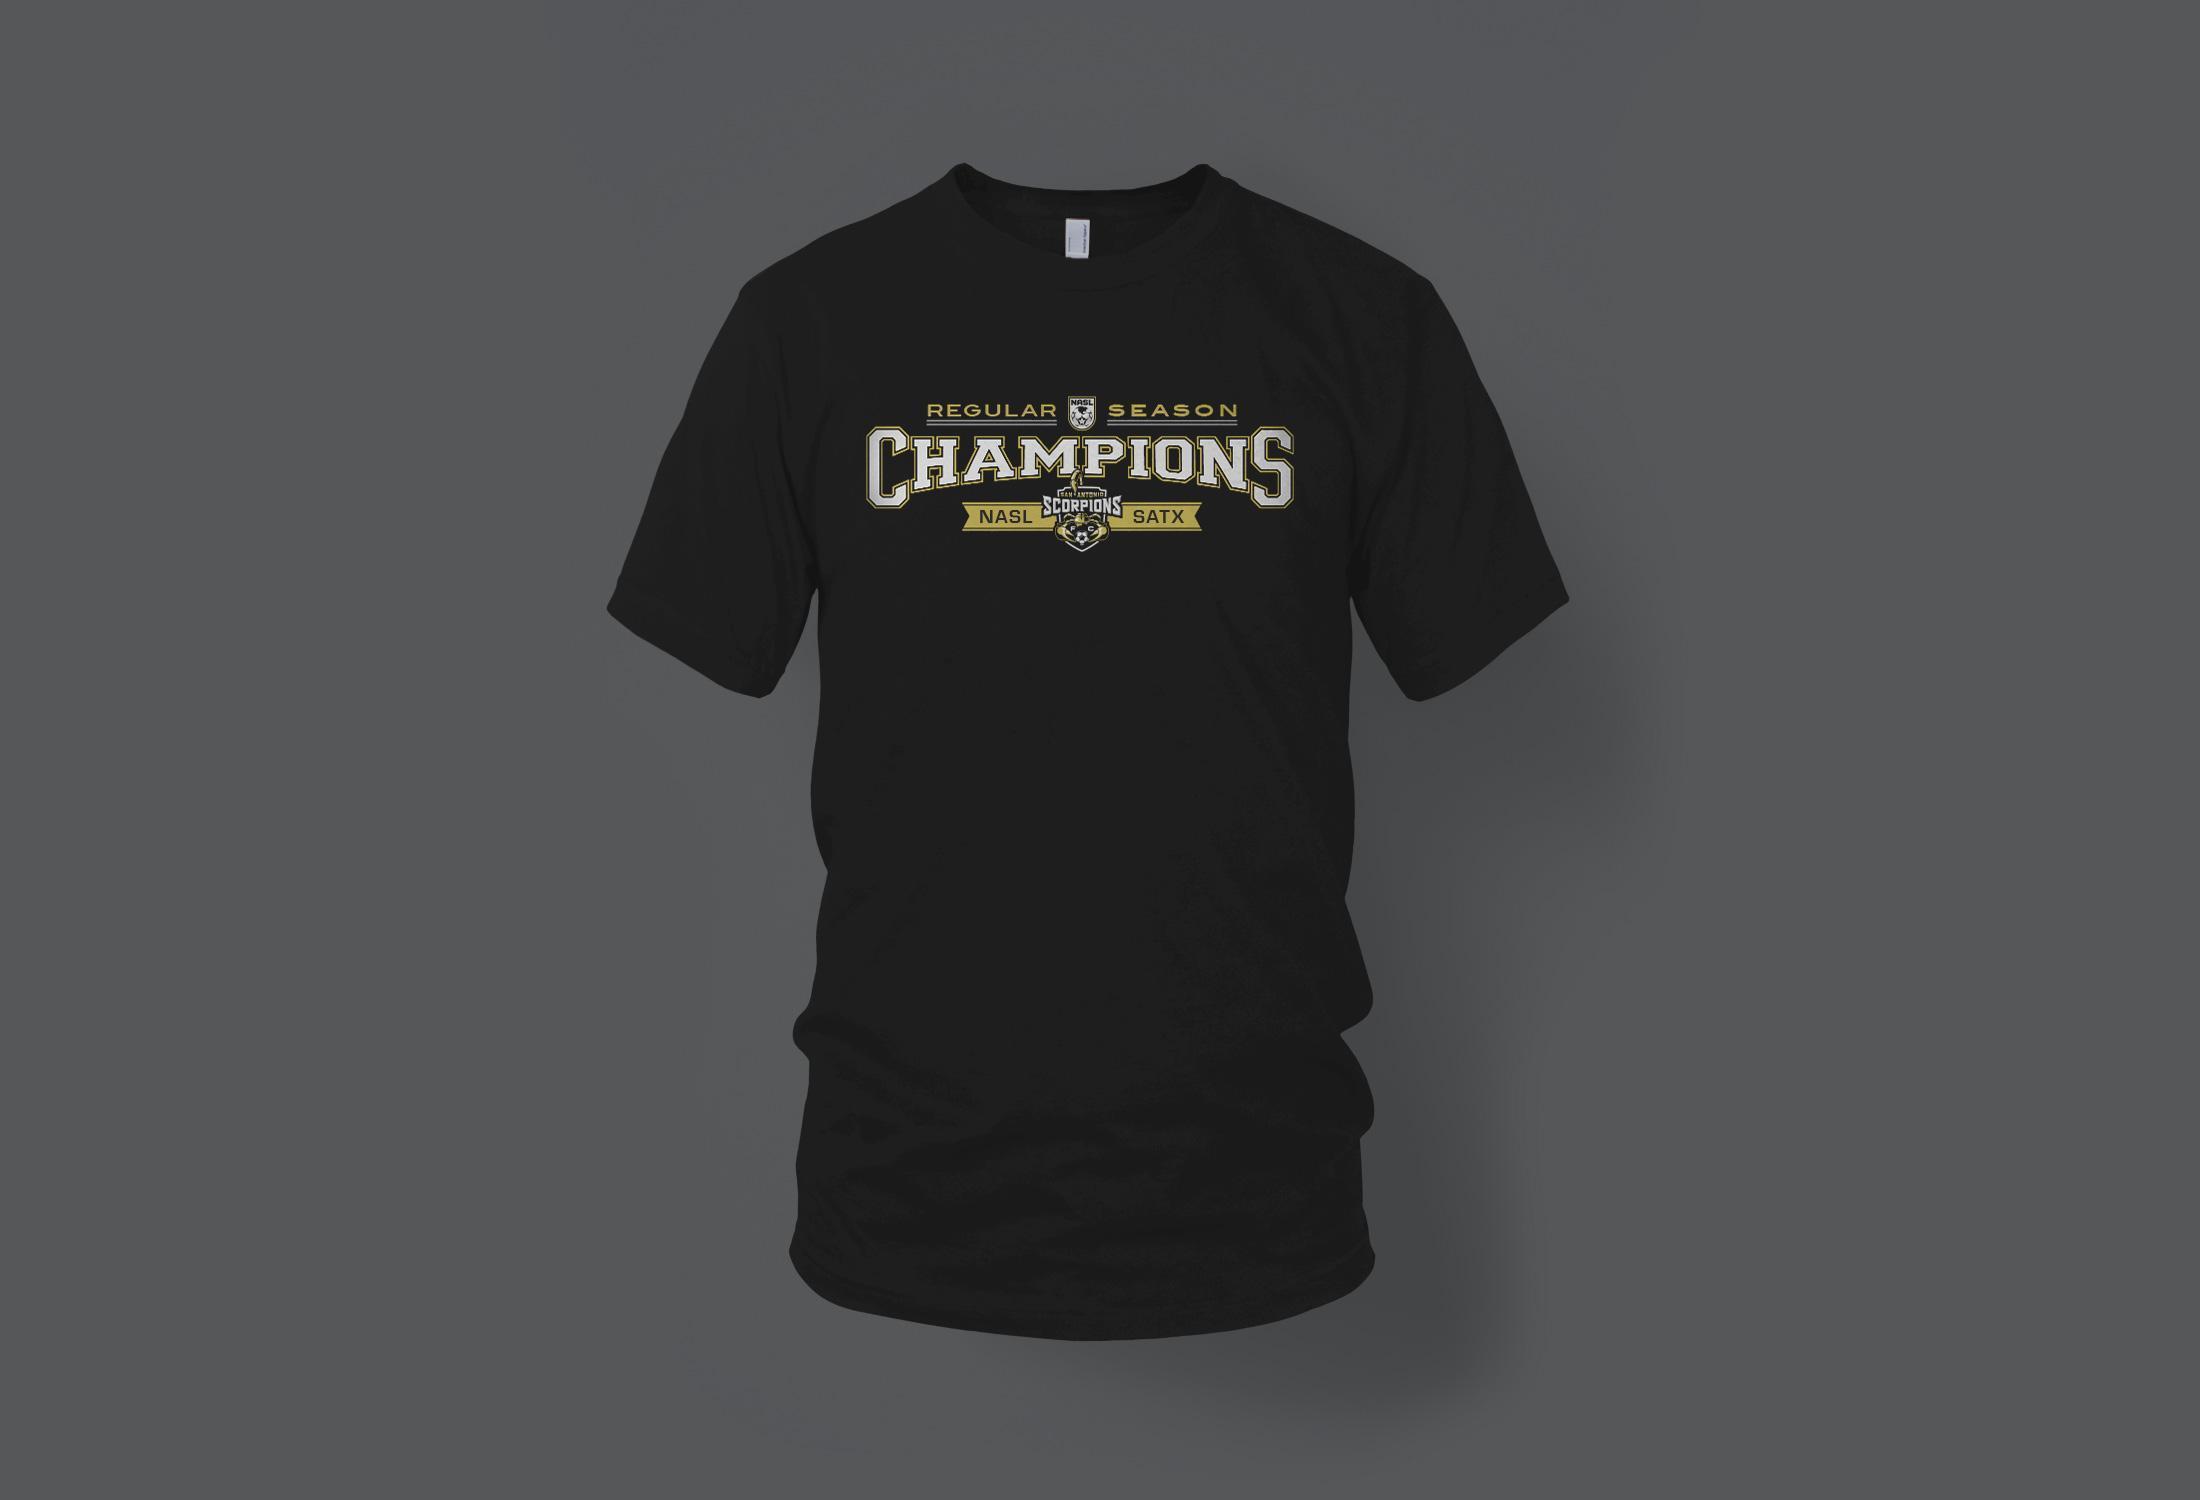 San Antonio Scorpions T-shirt Graphic Design